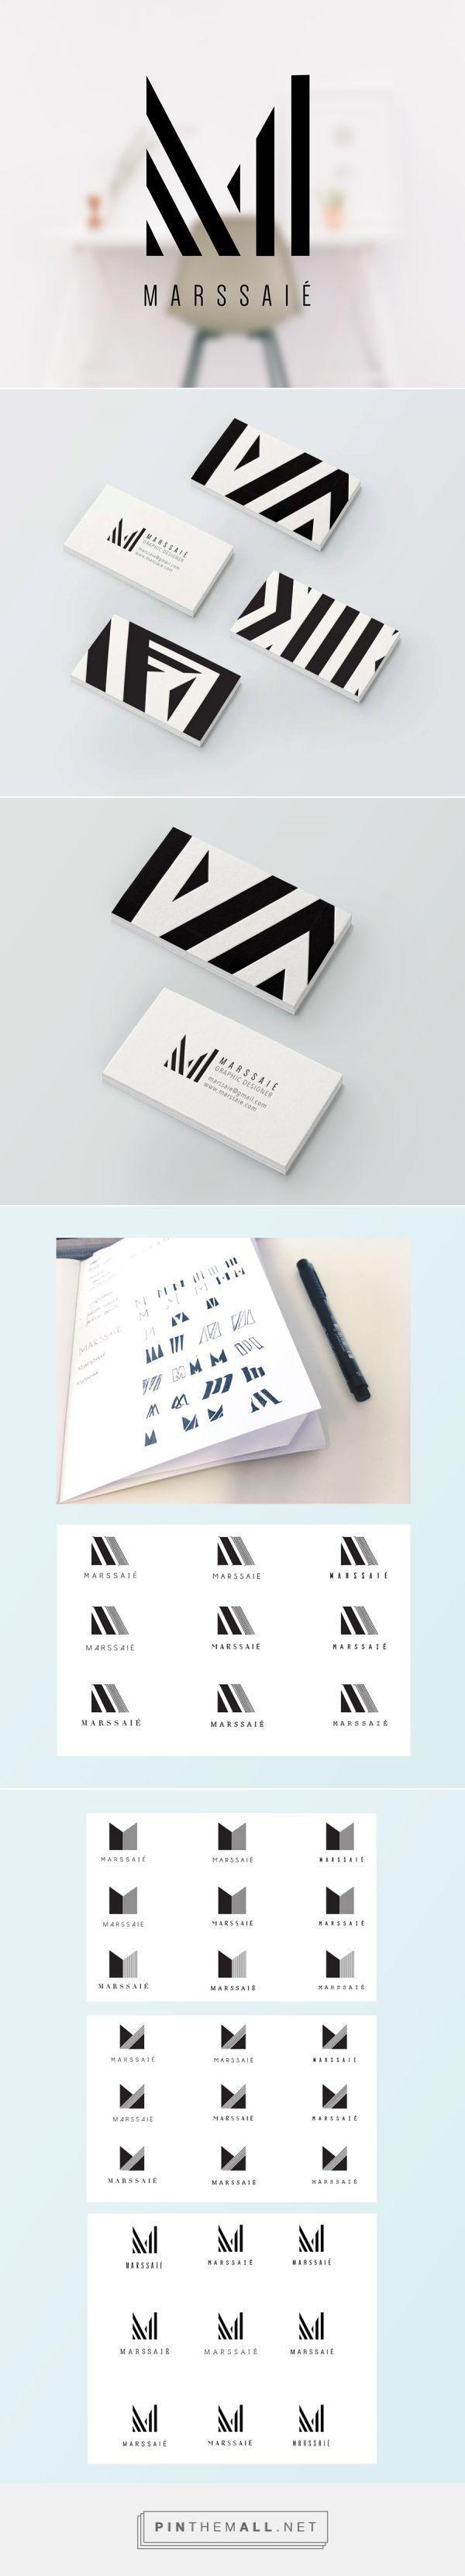 Marssaié personal identity Graphic designer visual